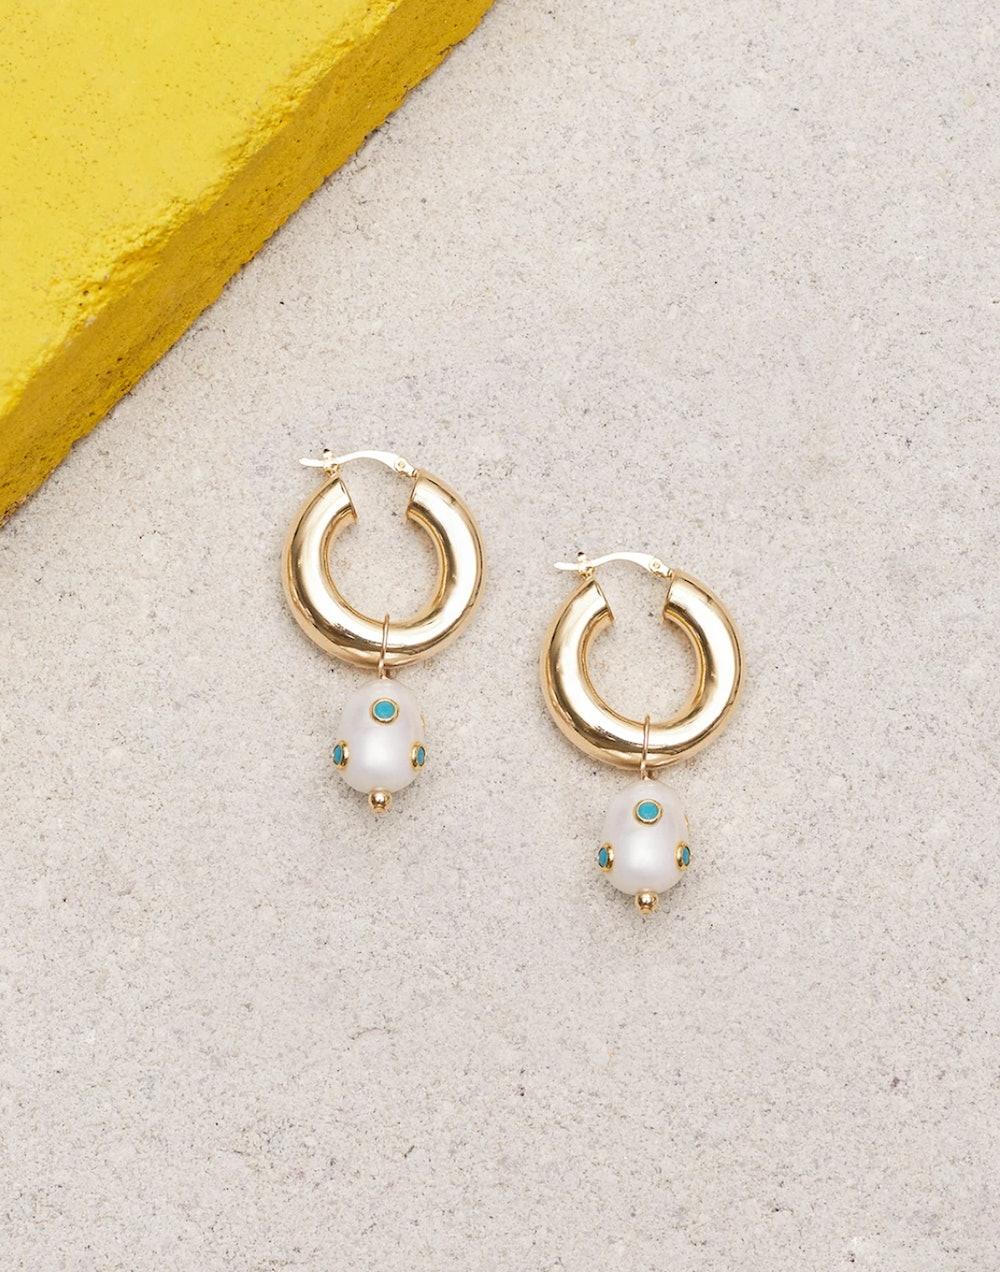 Lamia Turquoise Earrings